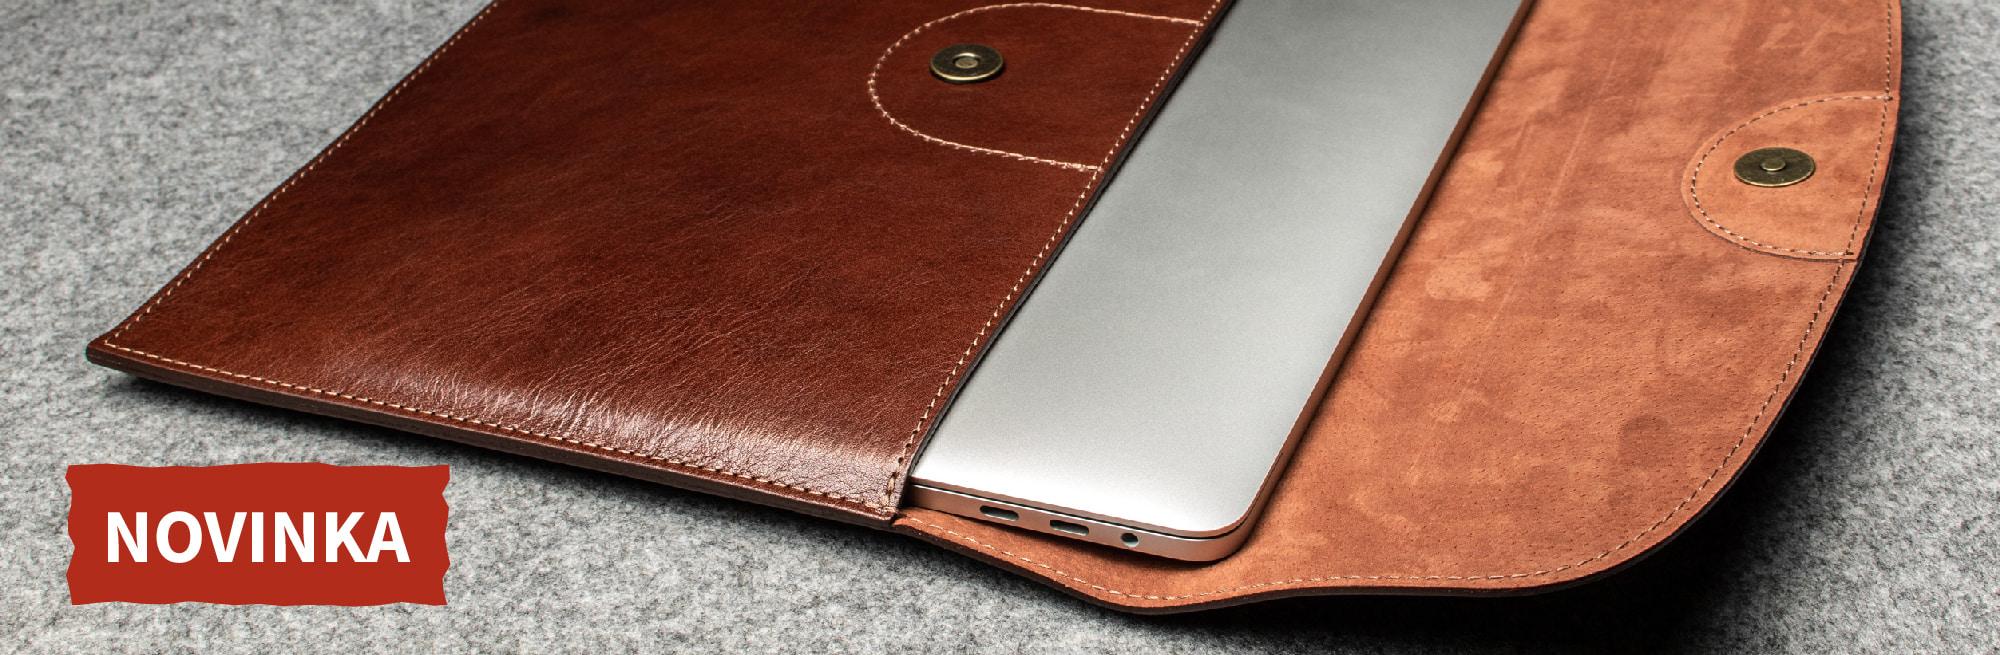 Obal na notebook - novinka